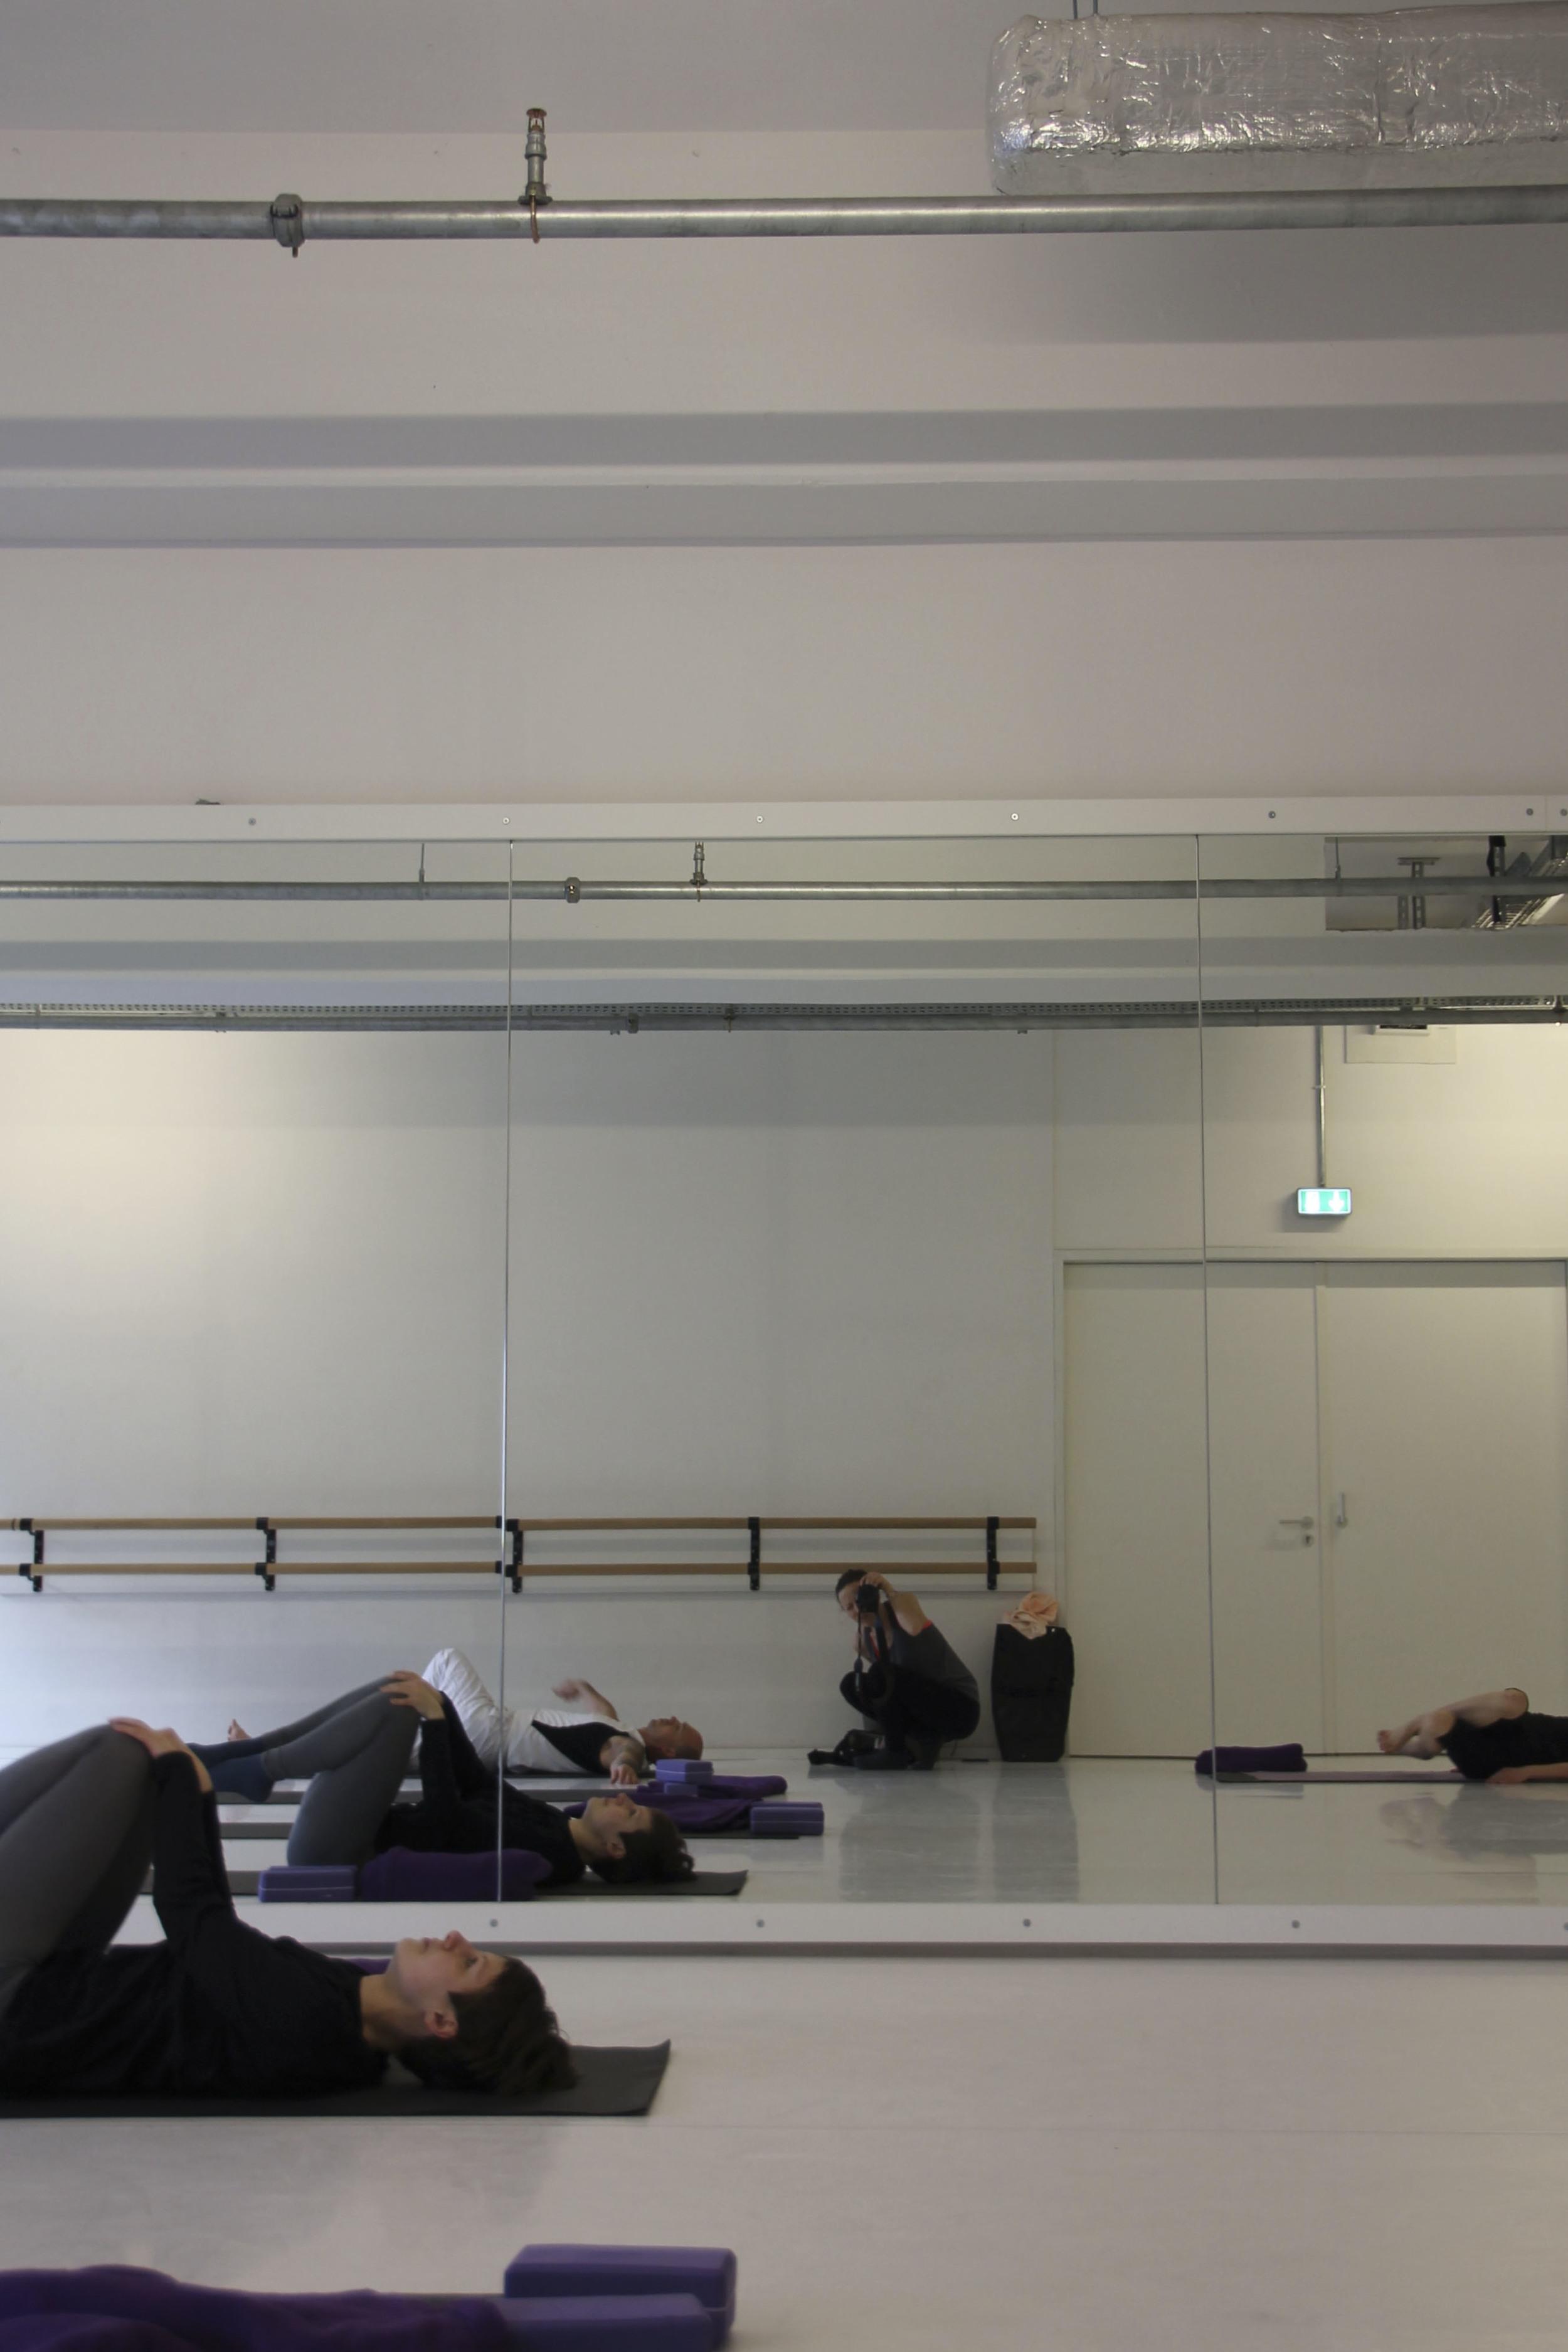 hip hop yoga berlin kreuzberg motions1360.jpg